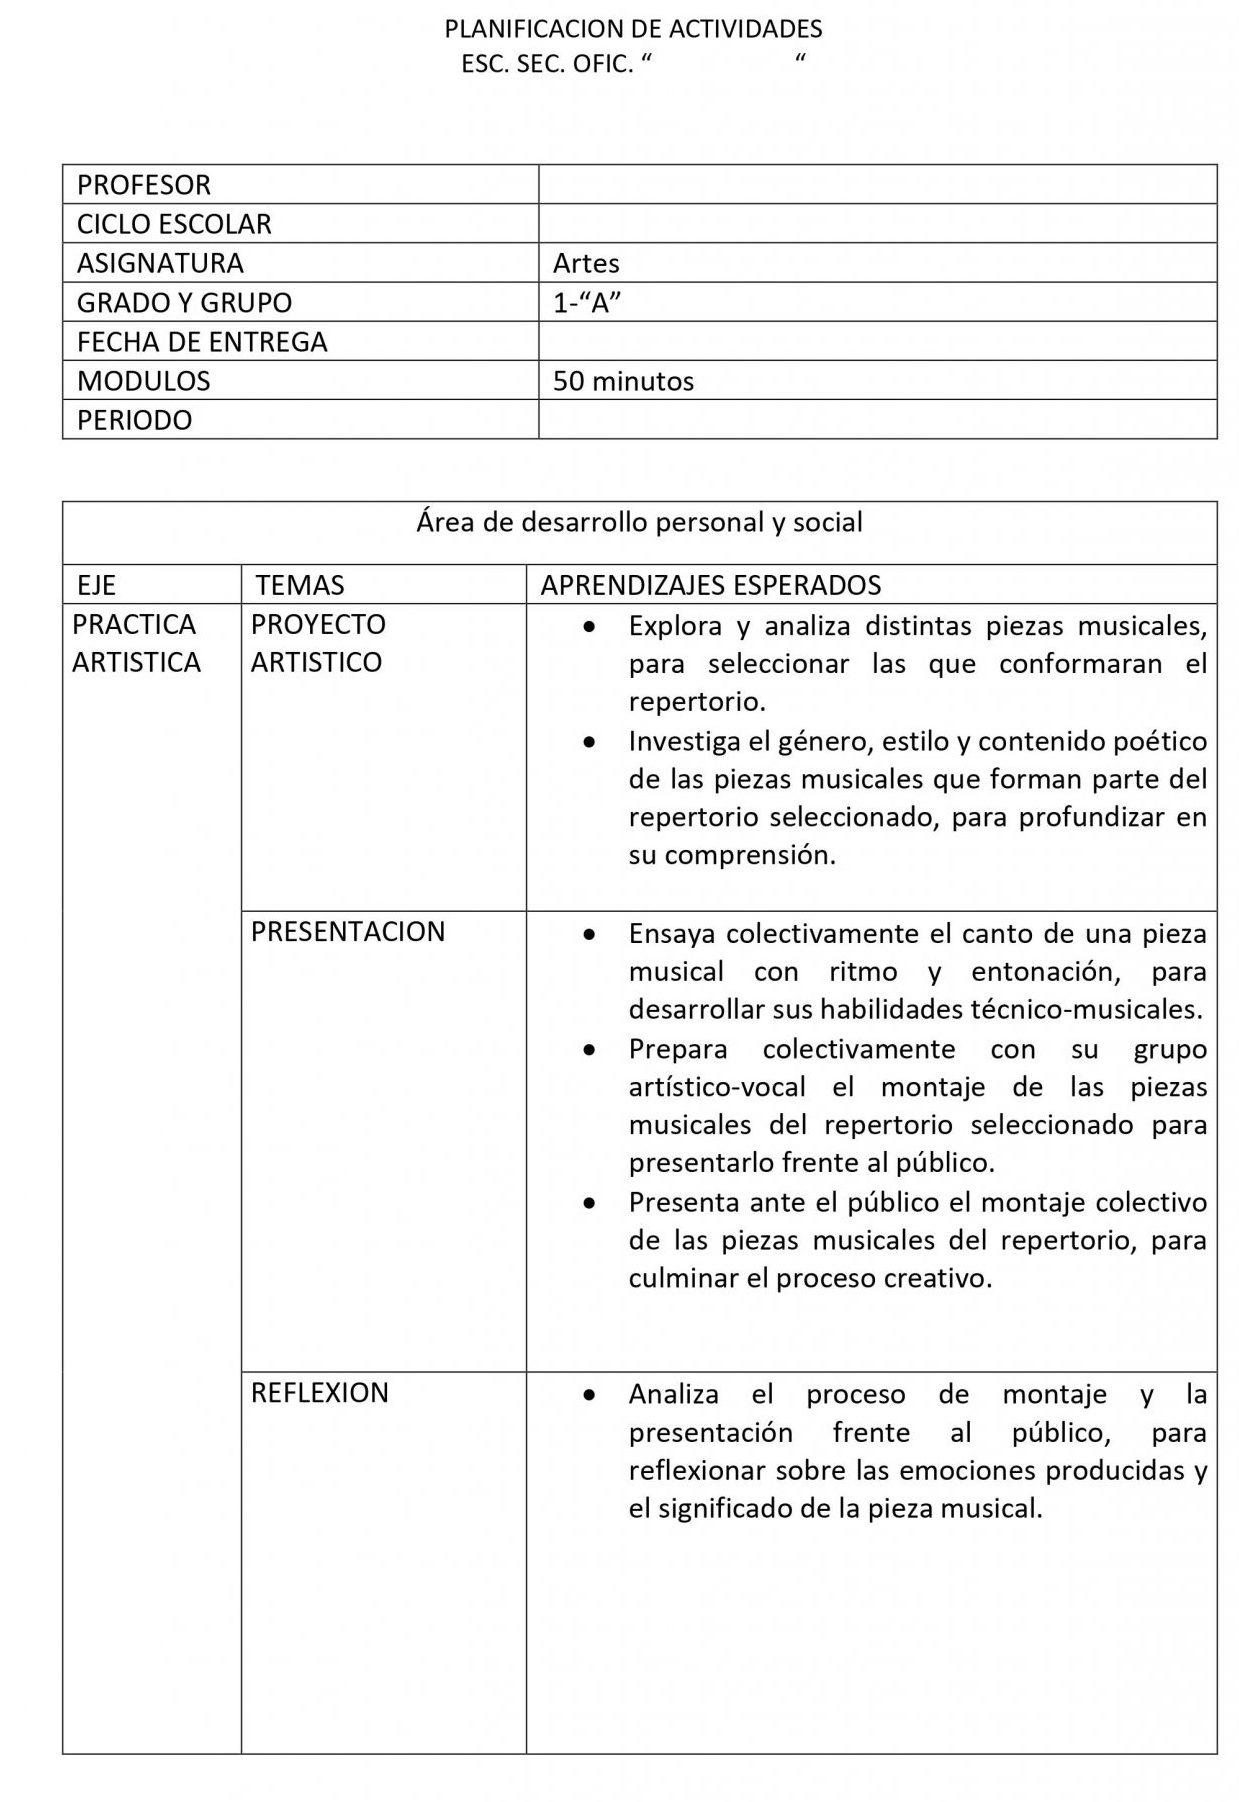 Planeaciones Artes Musica 1 Secundaria (Nuevo Modelo Educativo) 1er. Trimestre 01